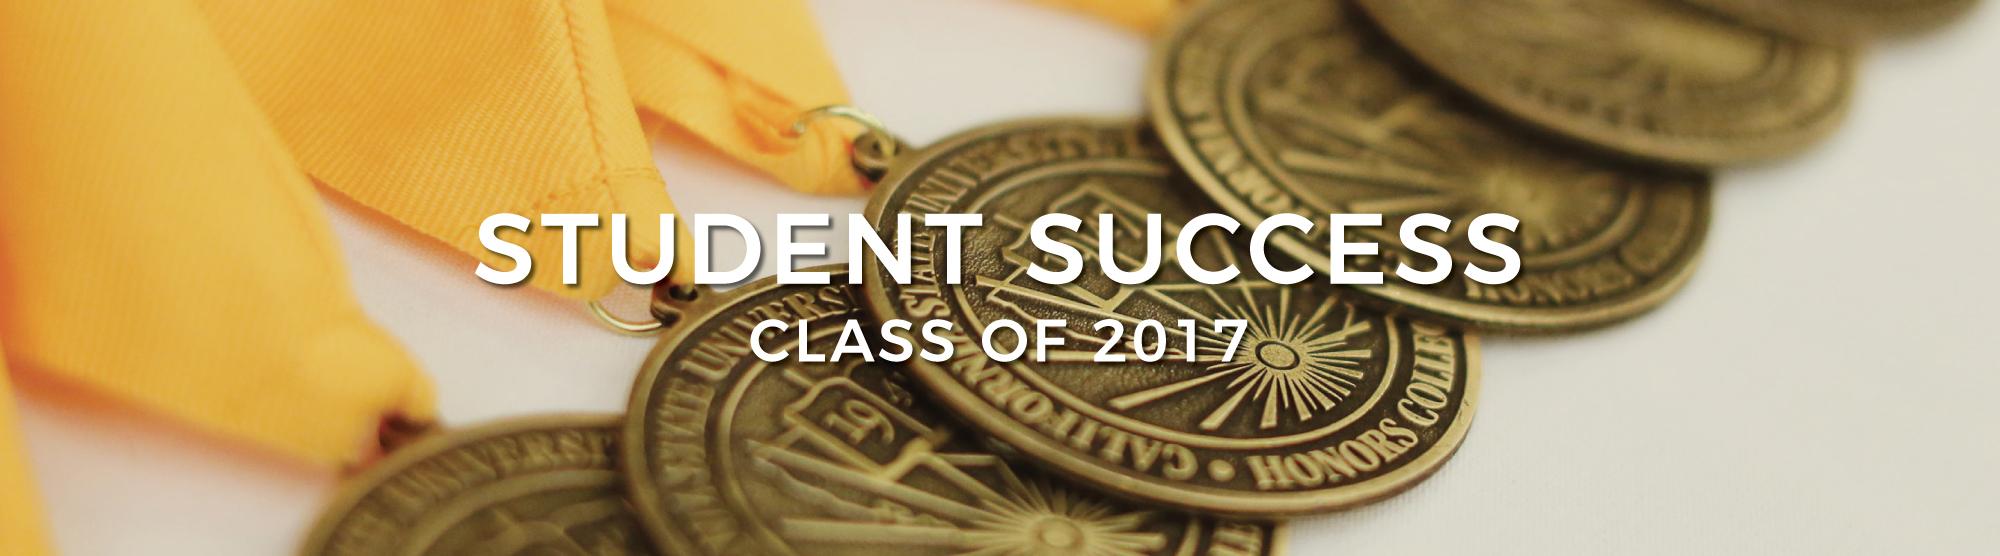 Student Success Class of 2017